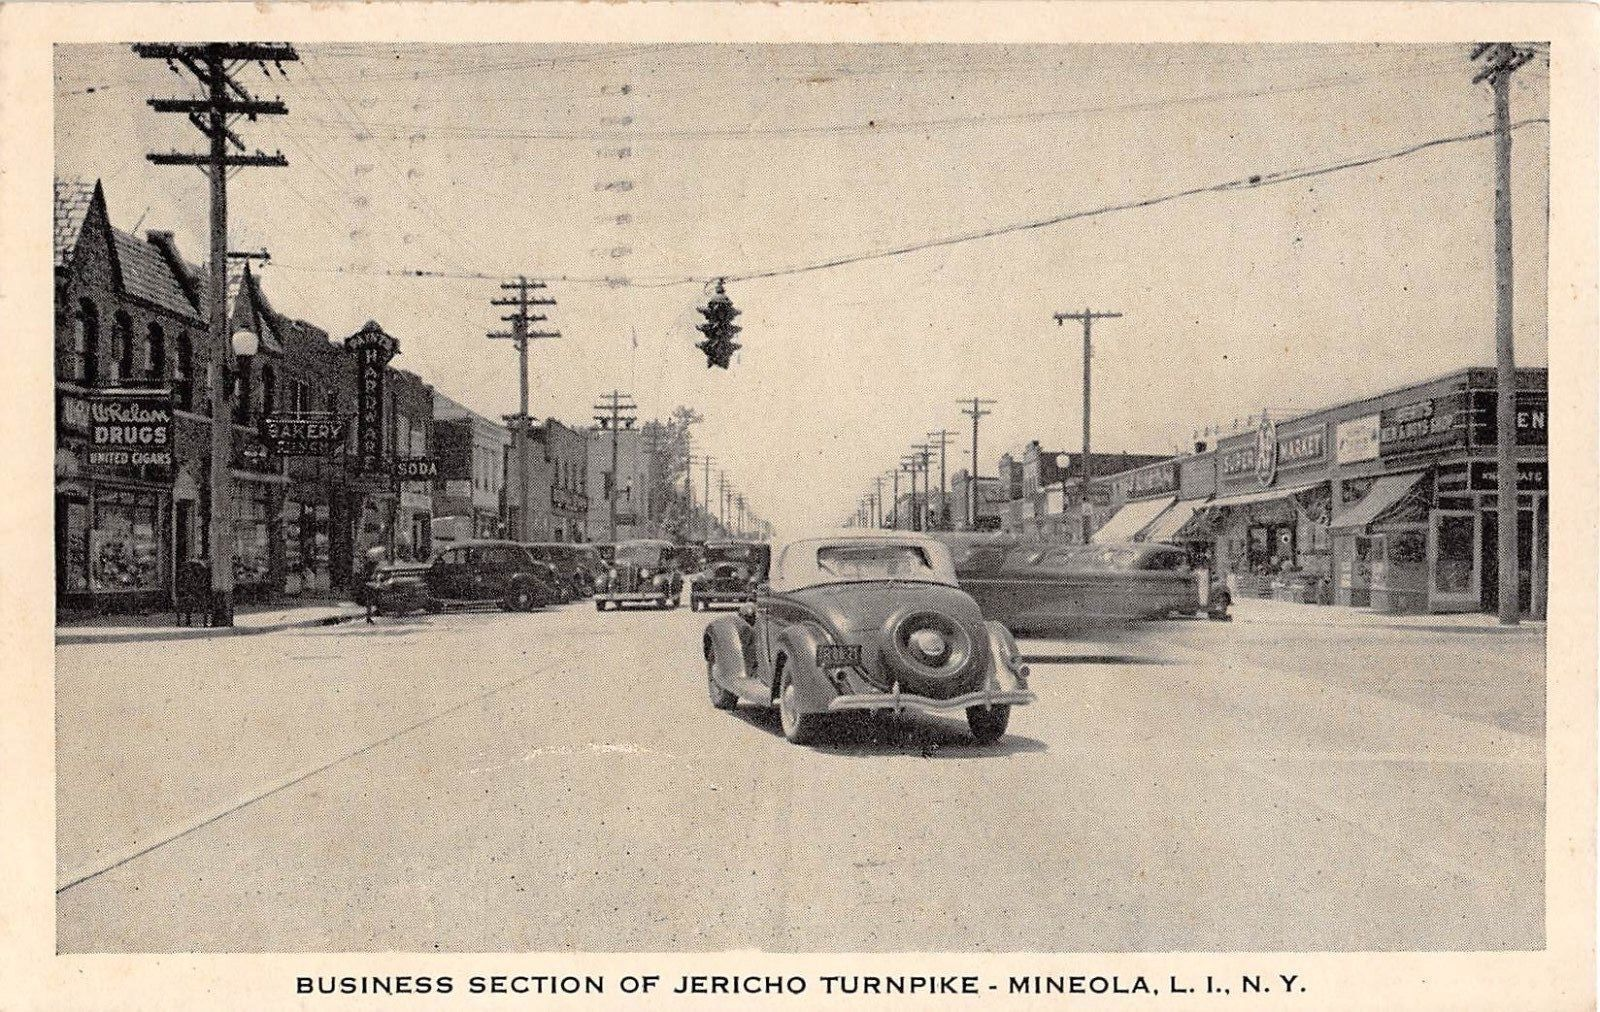 1942 Car Whelan Drug Store Other Stores Jericho Turnpike Mineola Li Ny Post Card Ebay Mineola Postcard Outdoor